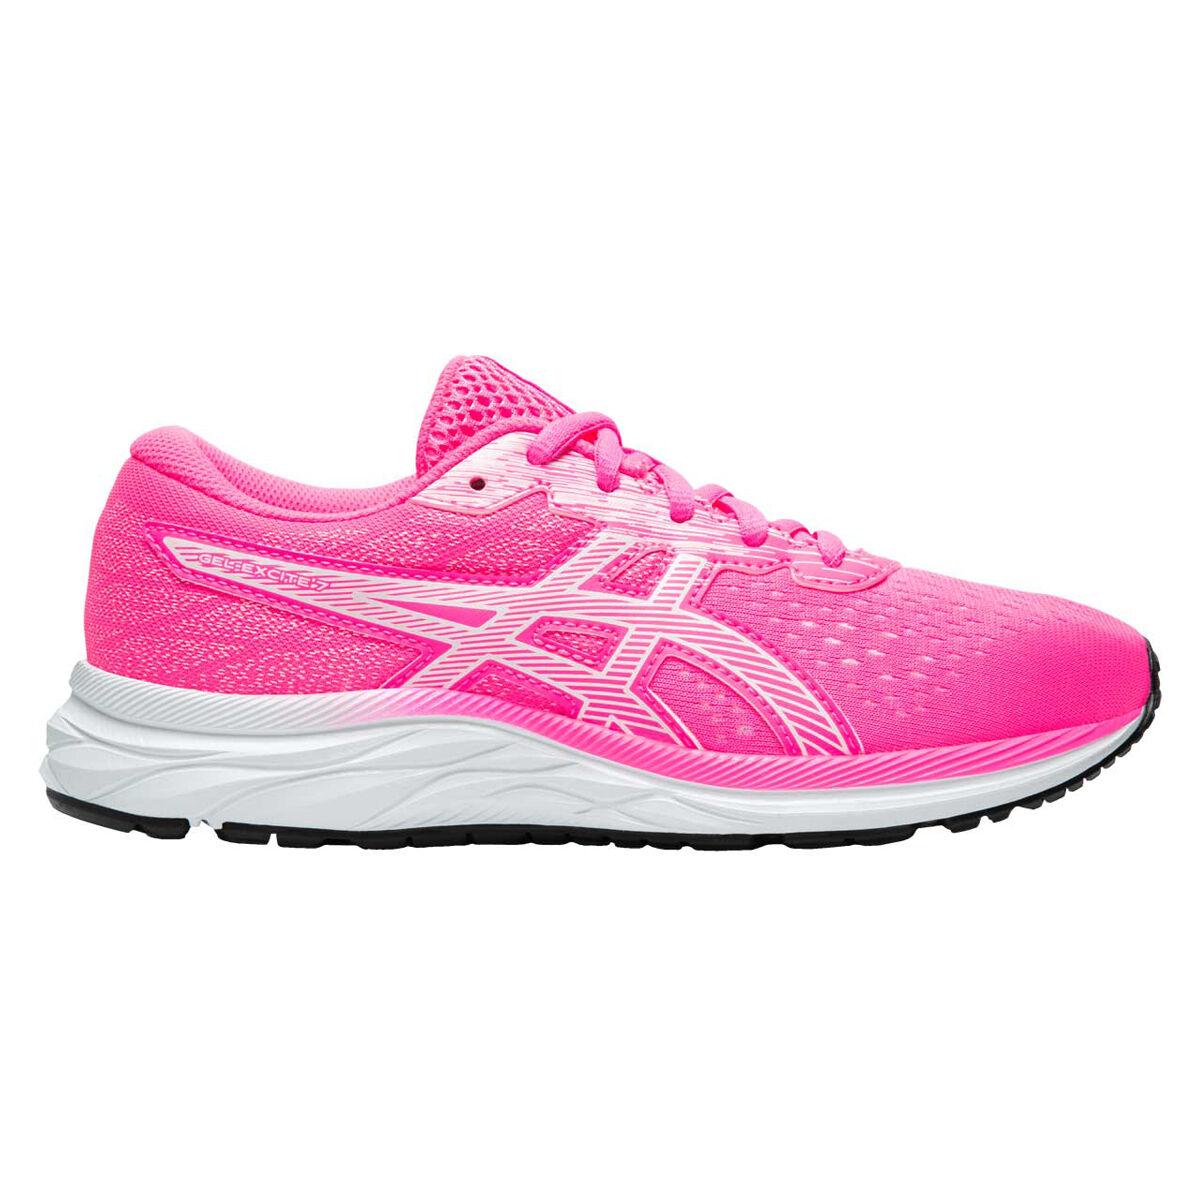 Asics GEL Excite 7 Kids Running Shoes Pink / White US 4